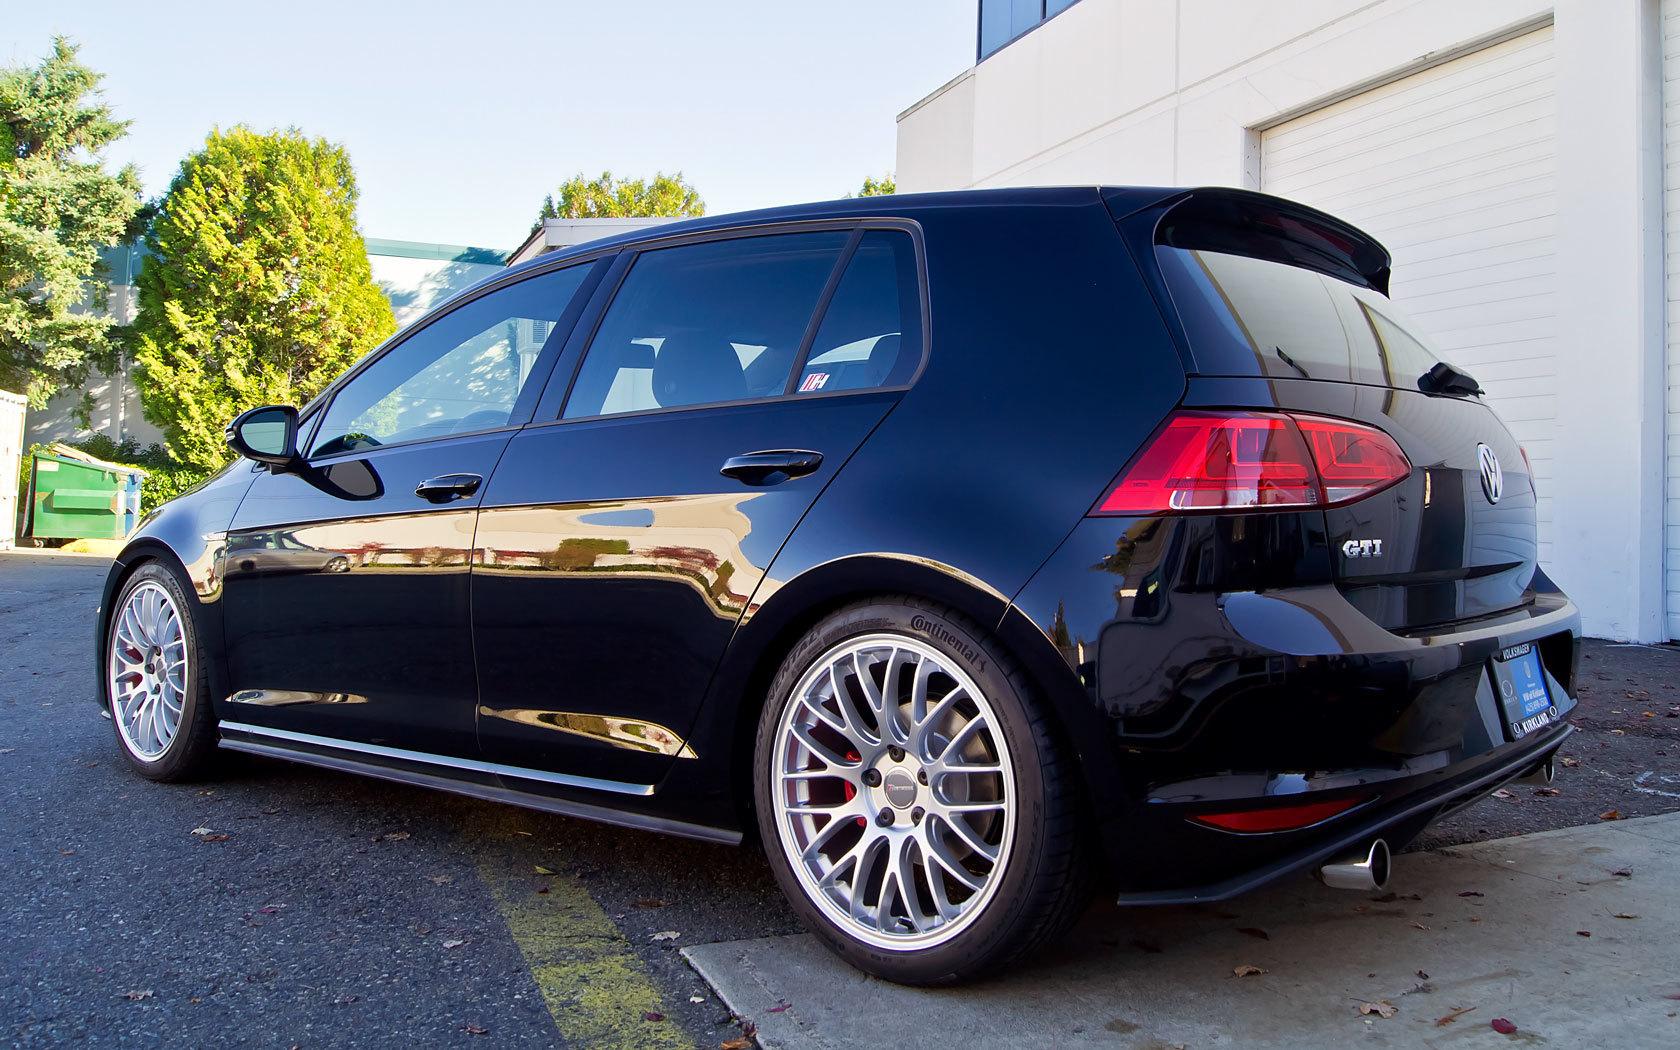 Hartmann Euromesh 4-GS Wheels for Volkswagen fitment - Hartmann Wheels